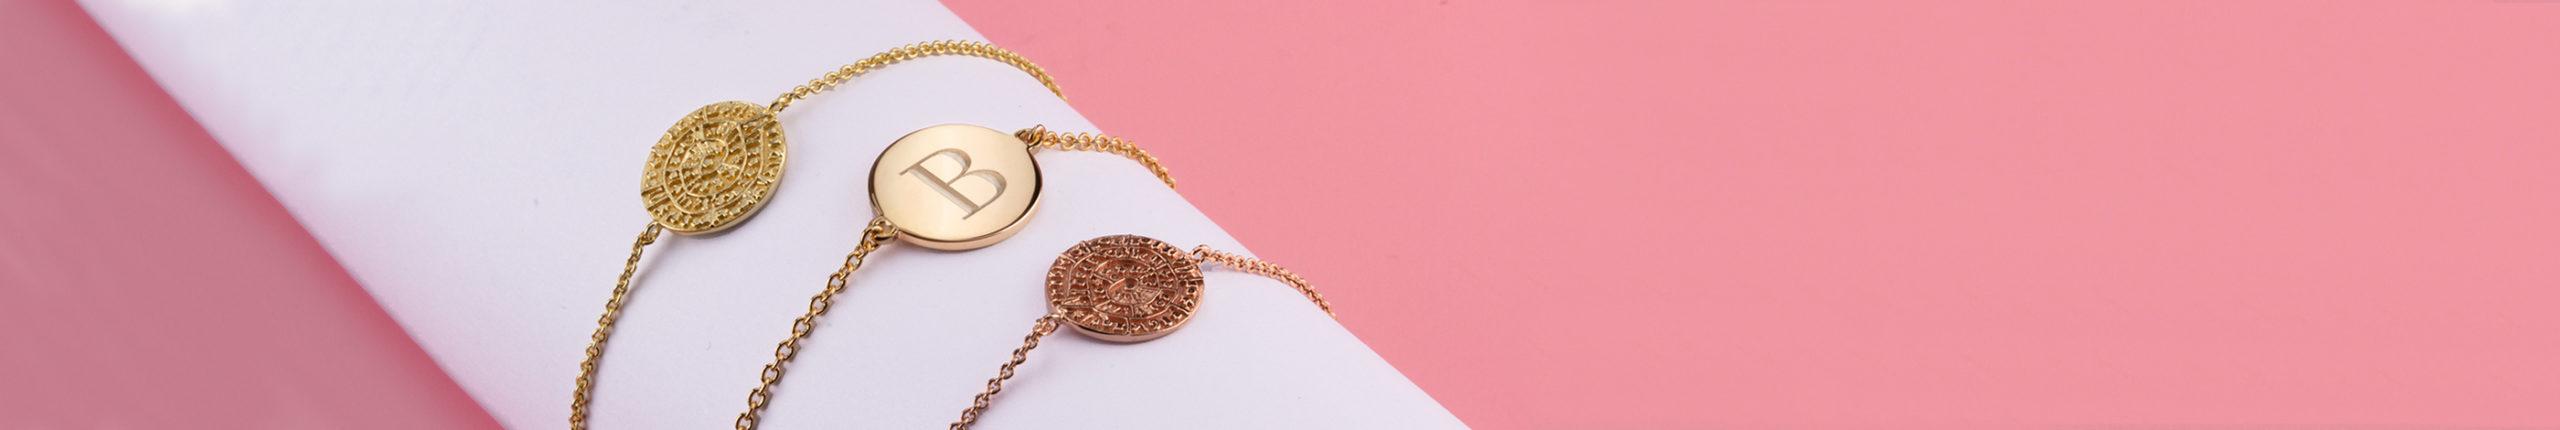 Category image for Engraved Bracelets